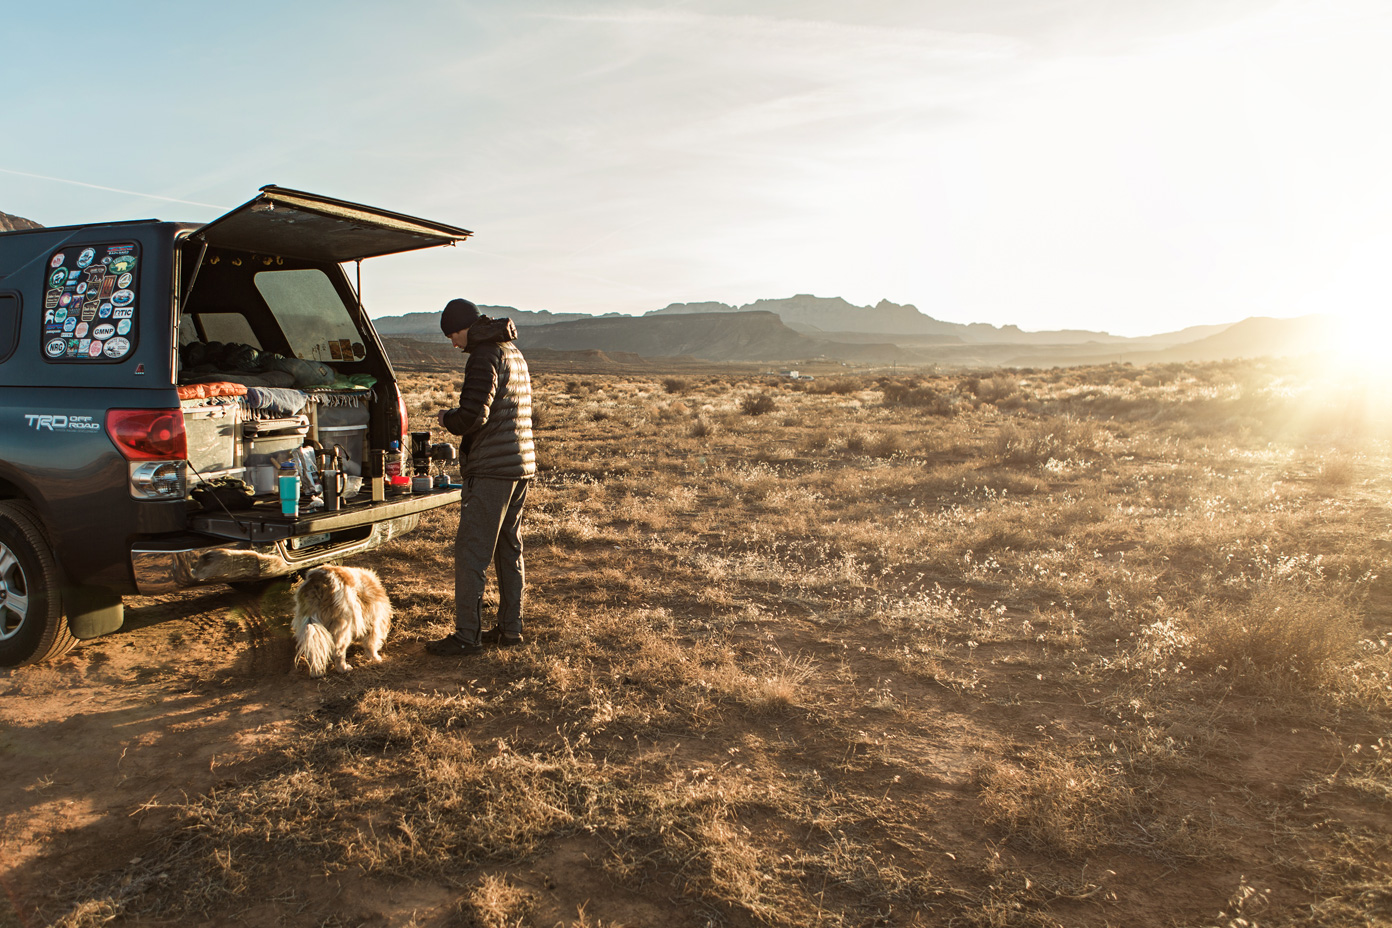 CindyGiovagnoli_Utah_Zion_desert_night_morning_coffee_blm_land_off_grid-007.jpg